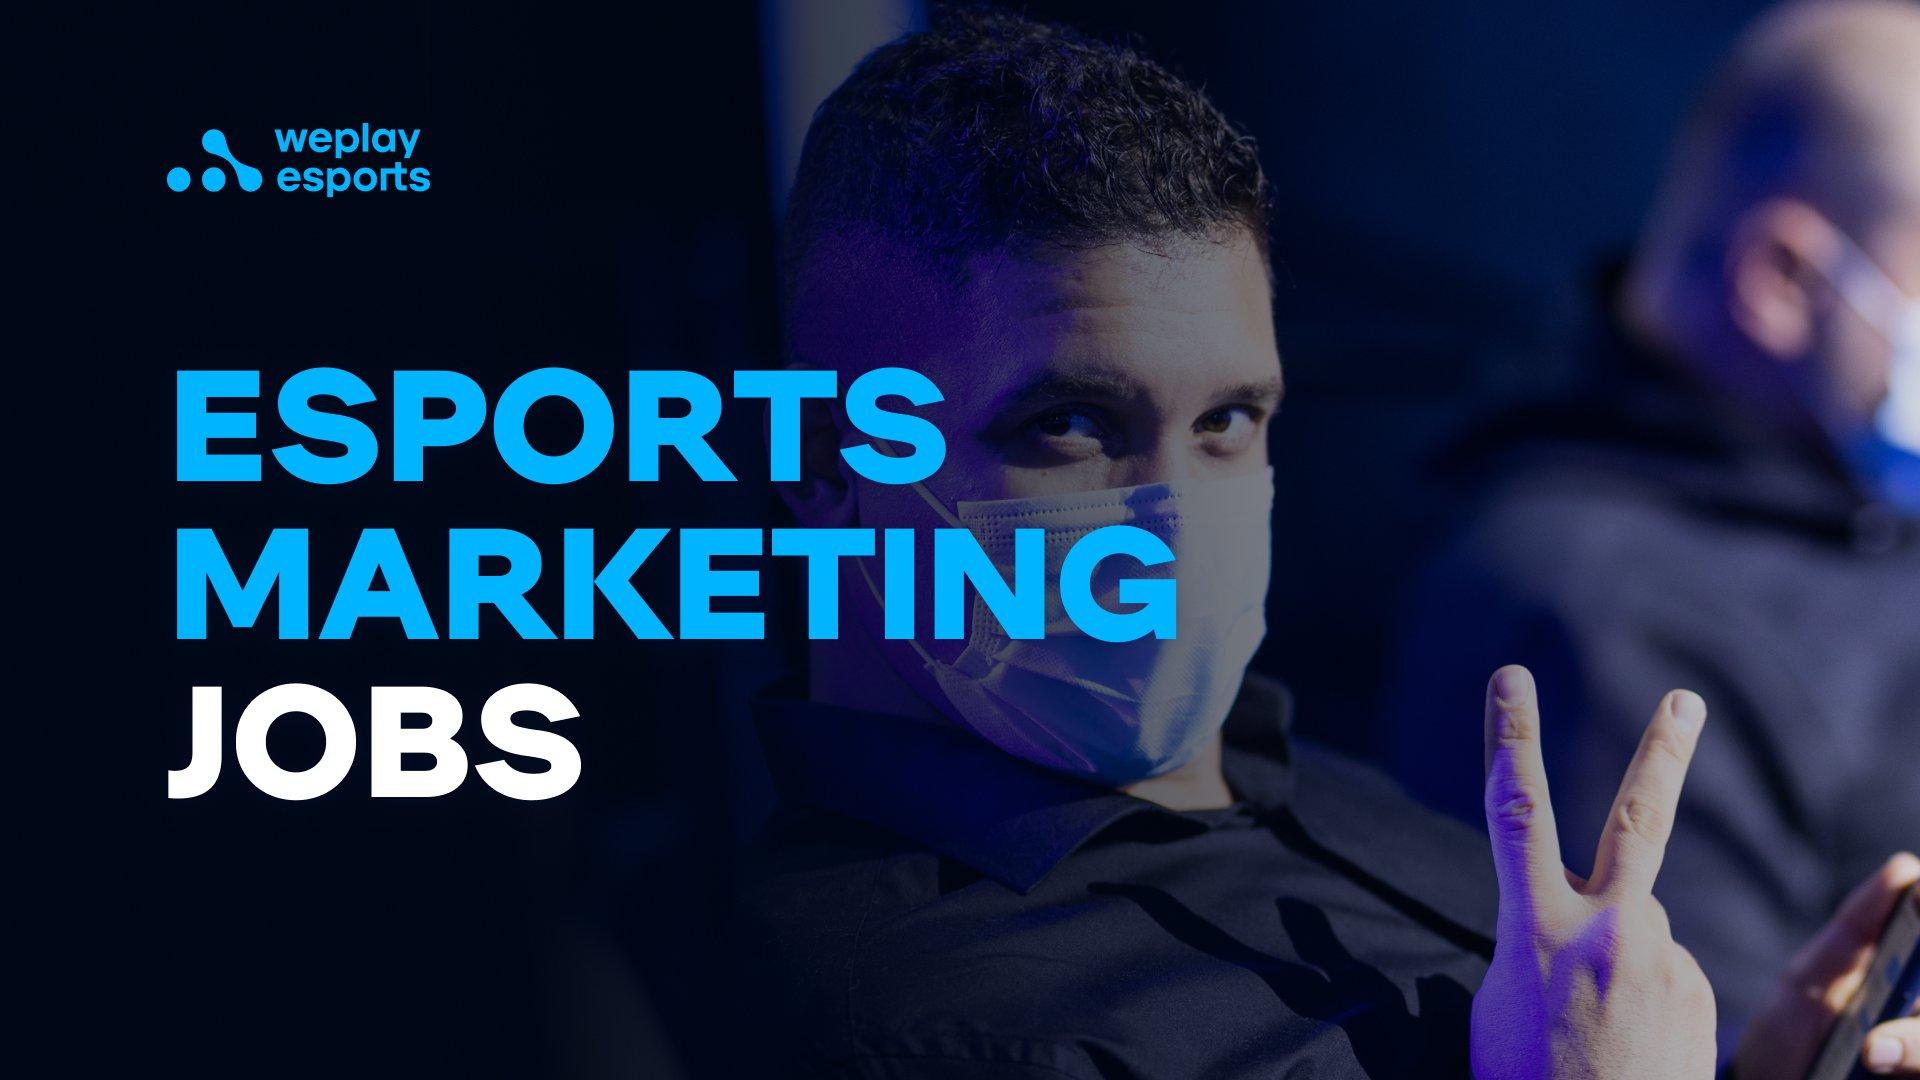 Esports Marketing Jobs